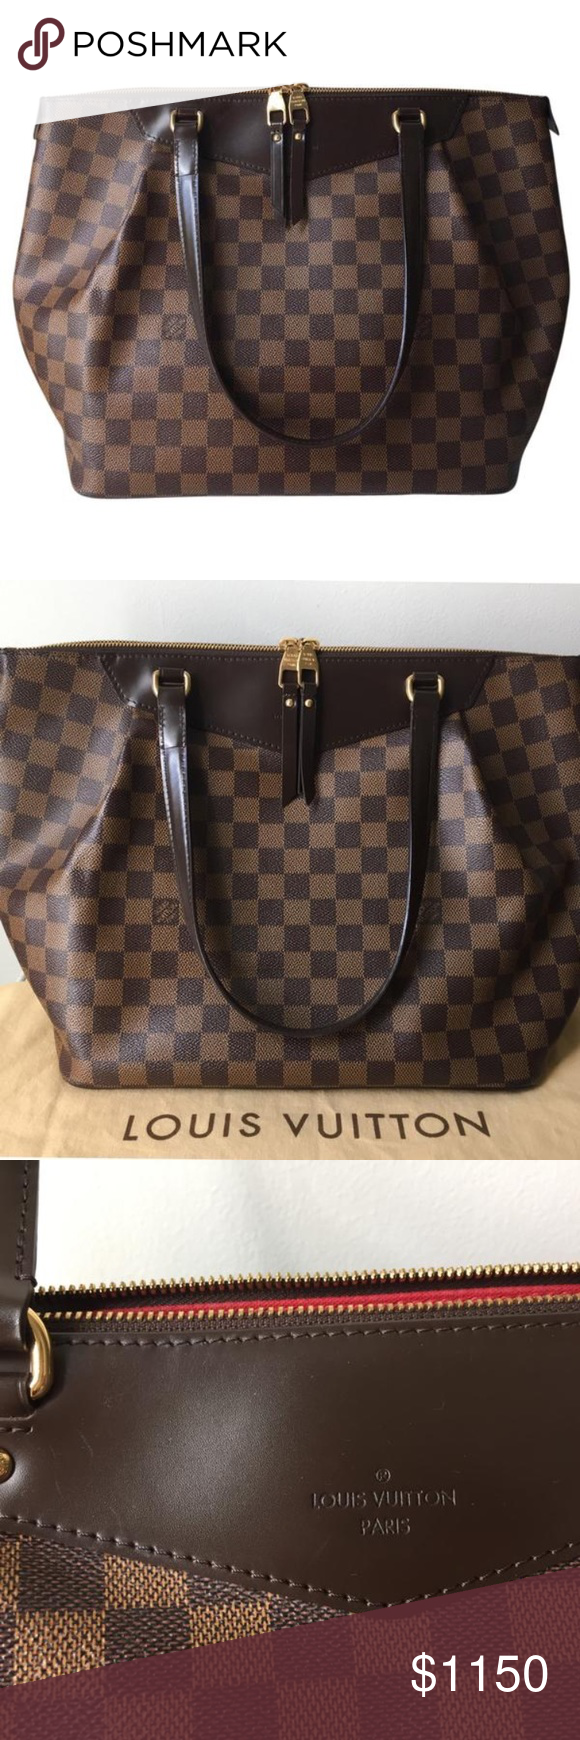 5034ea4e68d0 Louis Vuitton Westminster GM Damier Authentic Louis Vuitton. This gorgeous  bag has a lot of room. 3 pockets on the inside. It has mild marks. Handle  ...